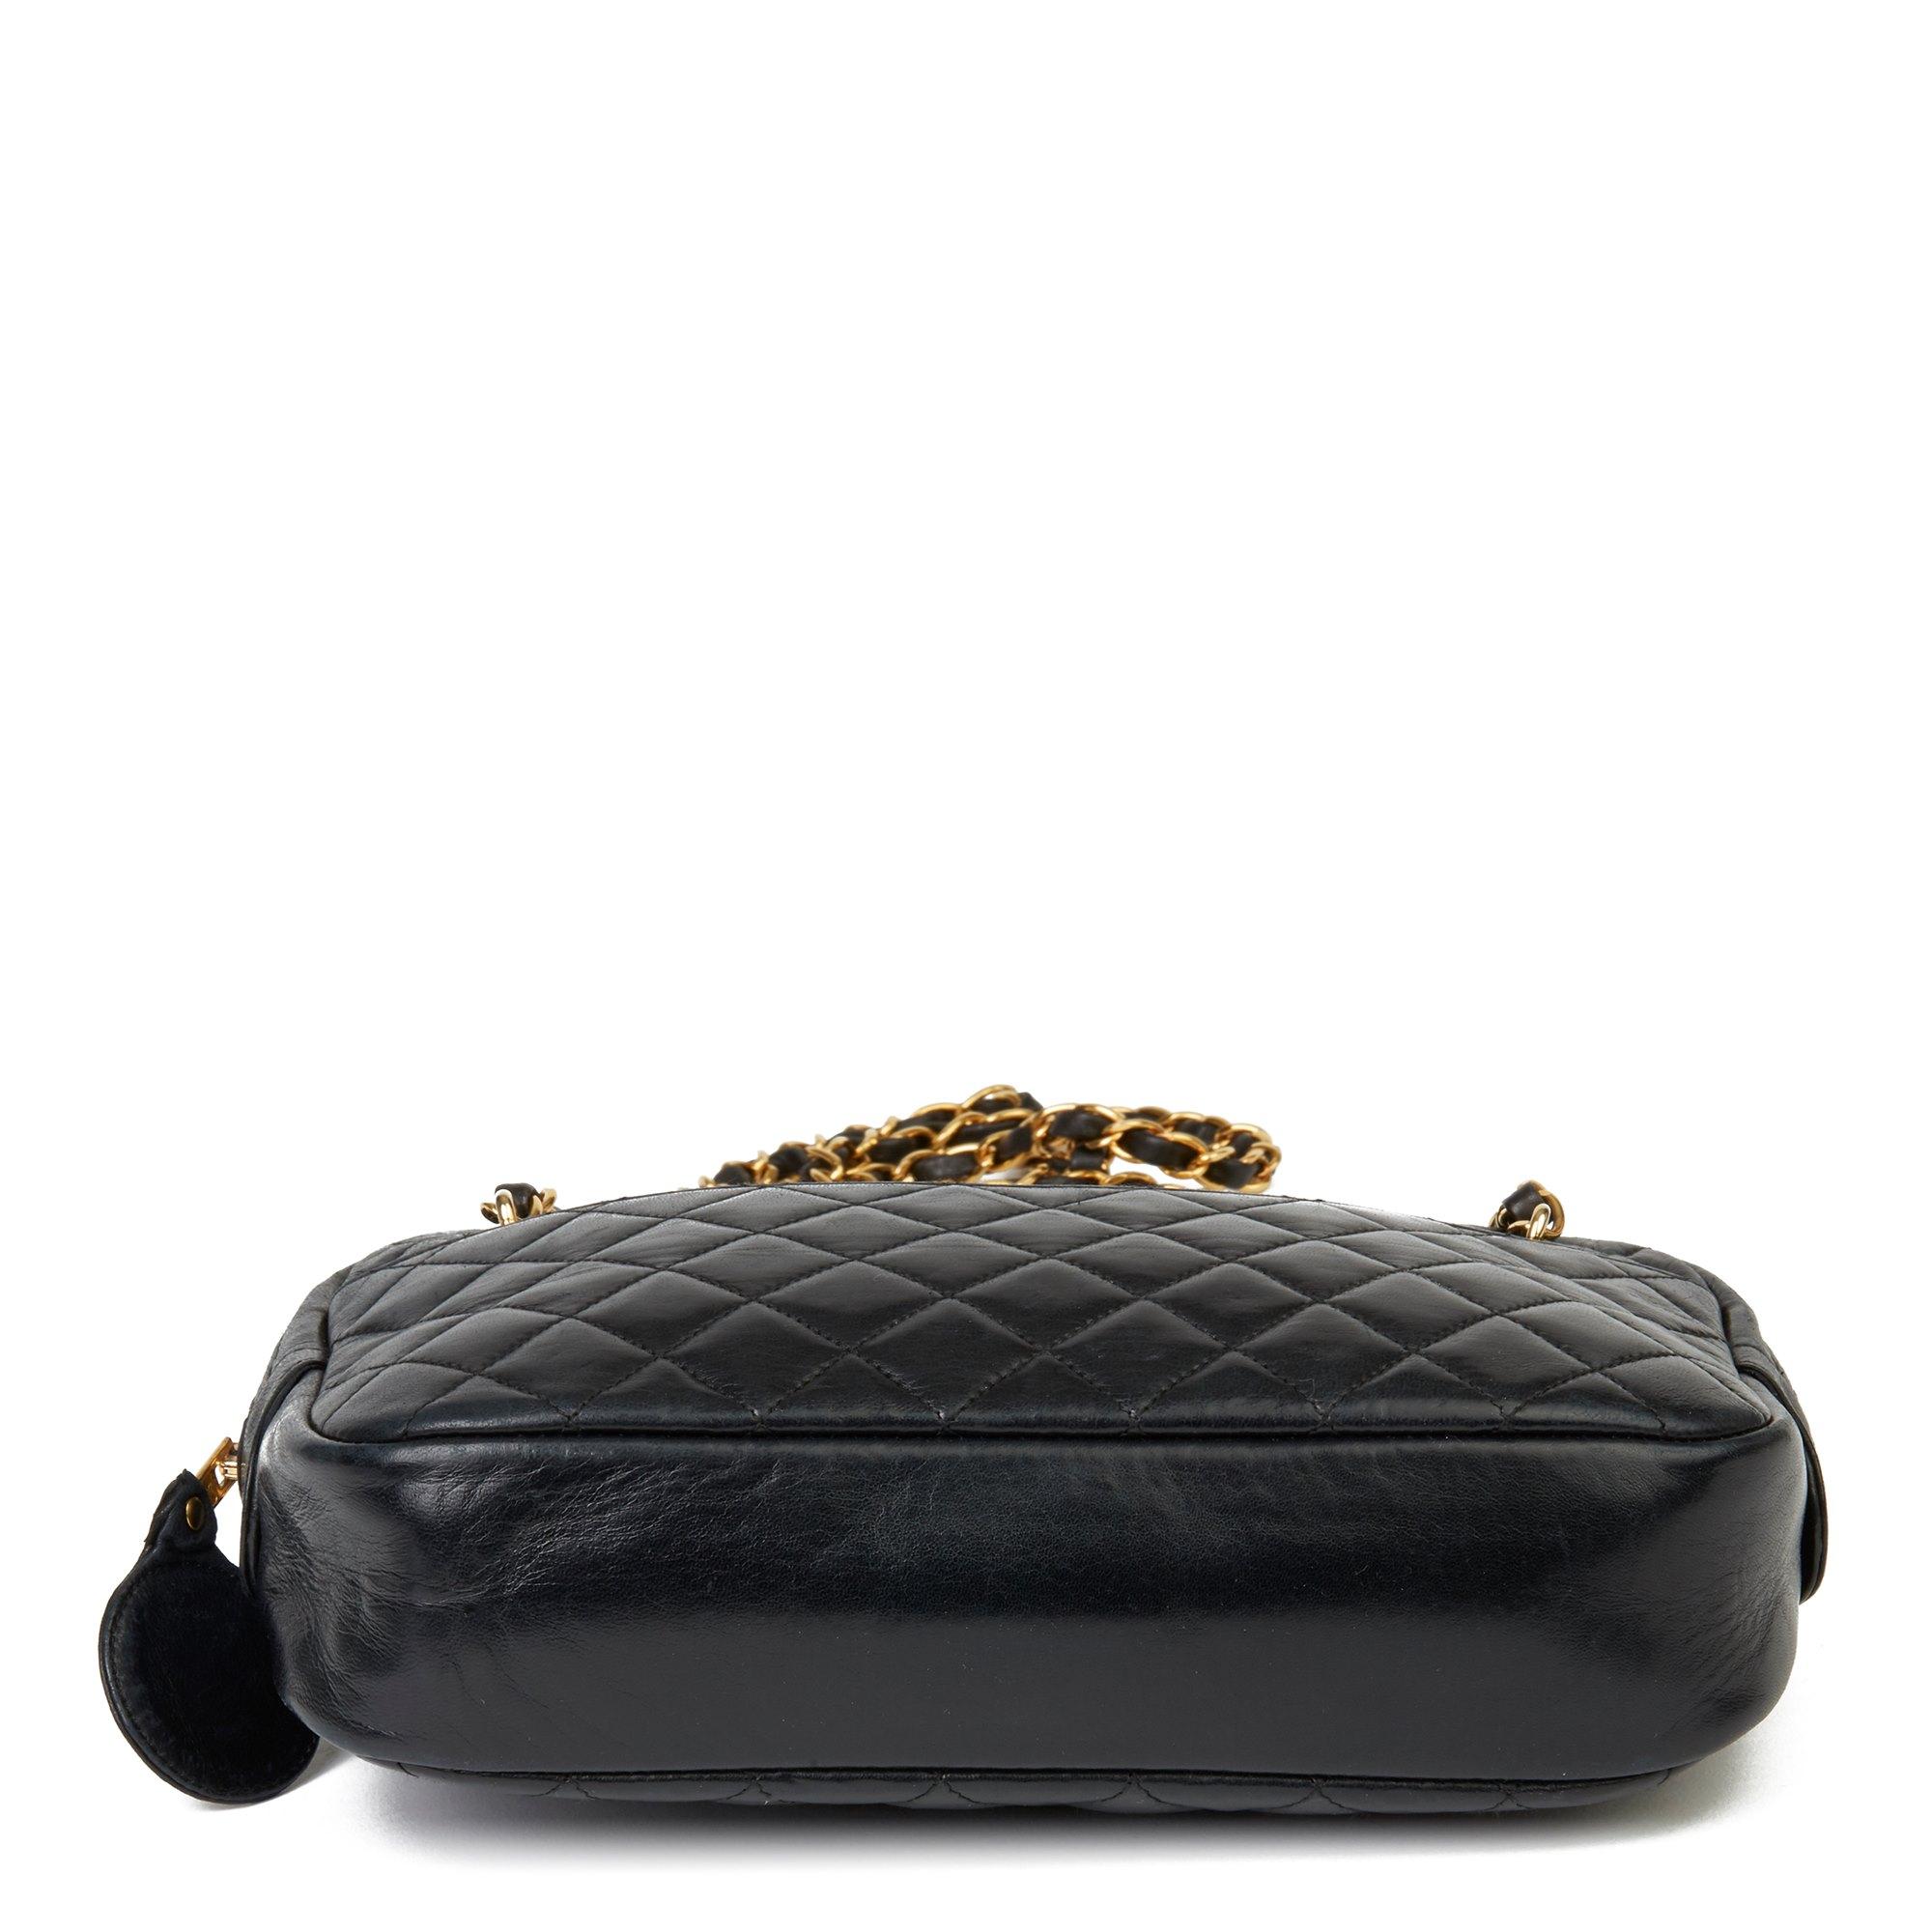 Chanel Black Quilted Lambskin Vintage Timeless Camera Bag